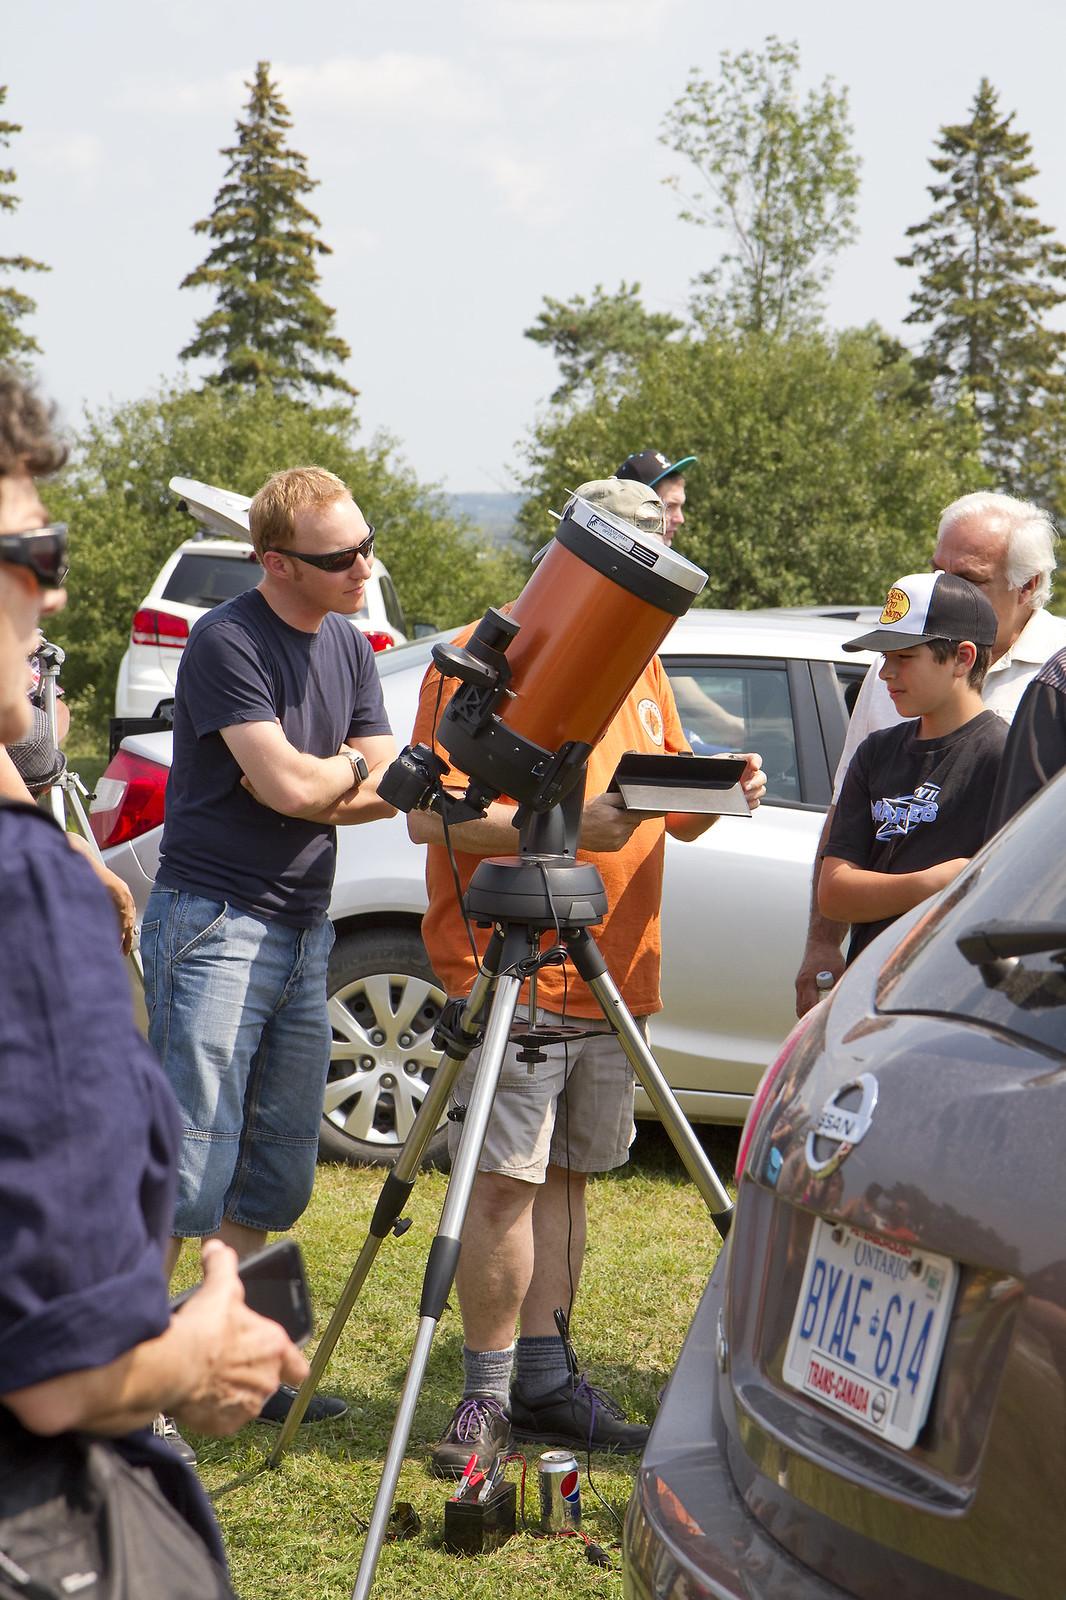 solar eclipse - telescope with camera